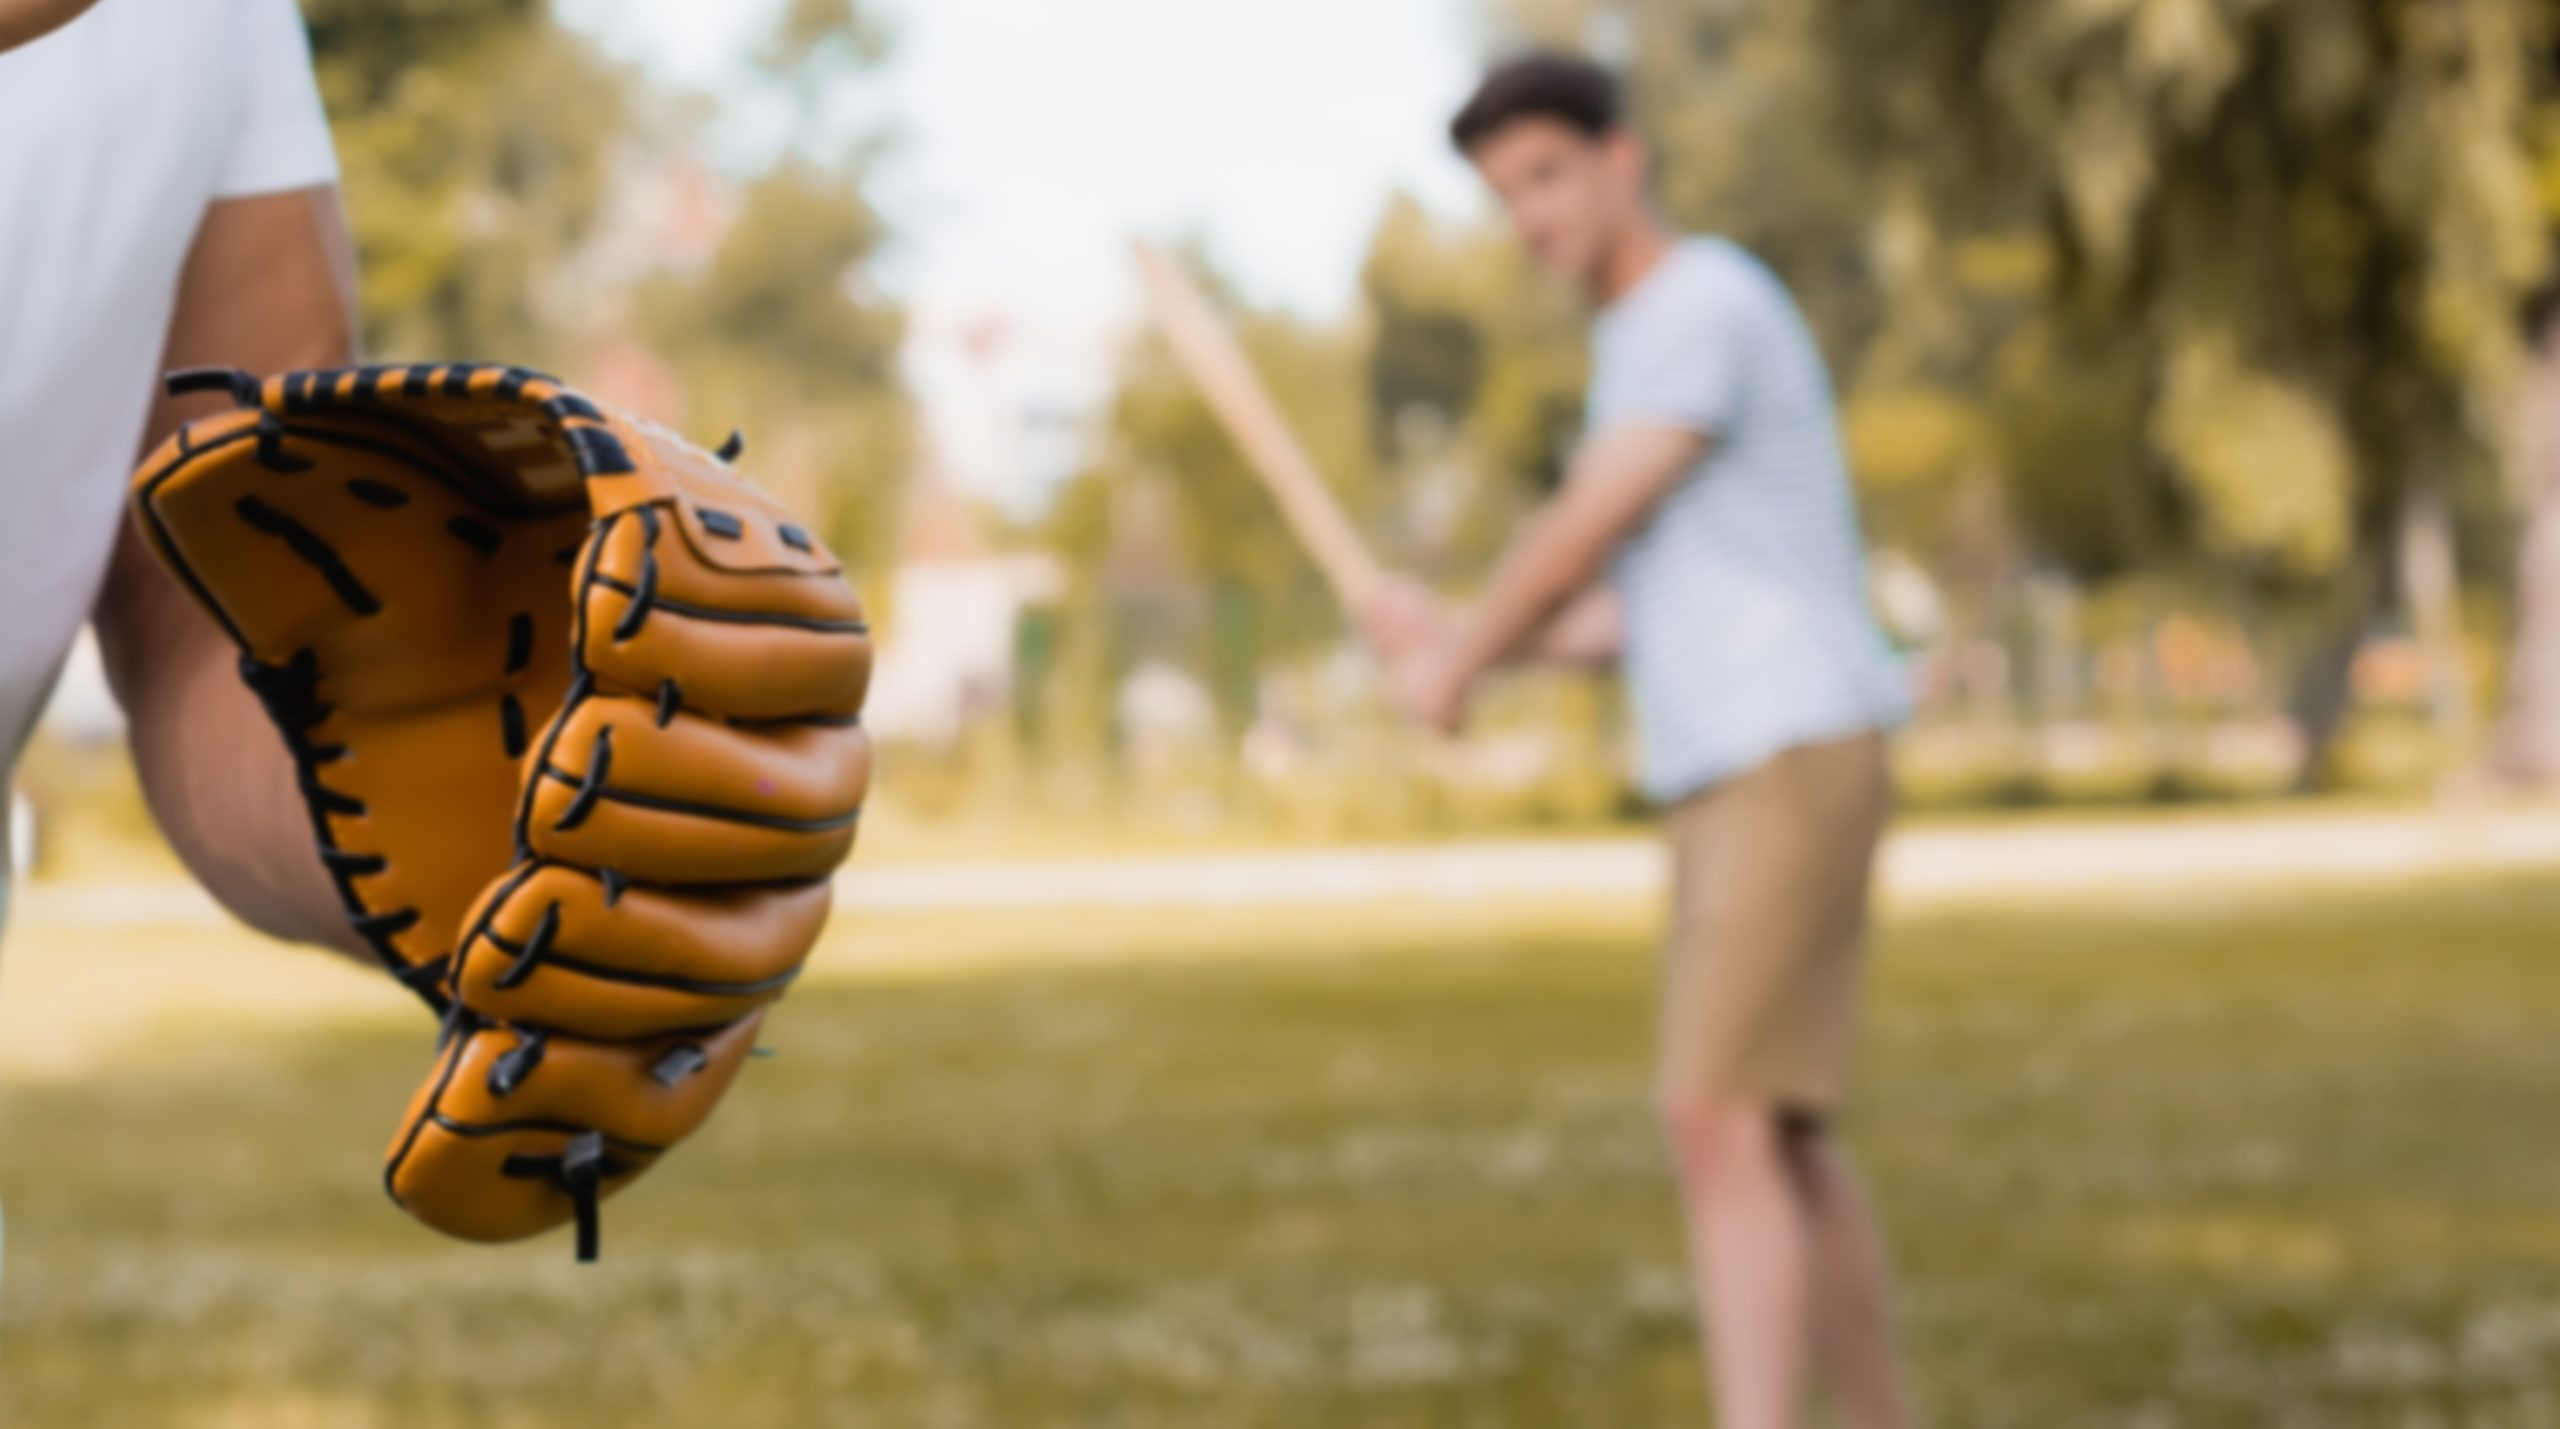 best softball glove for small hands